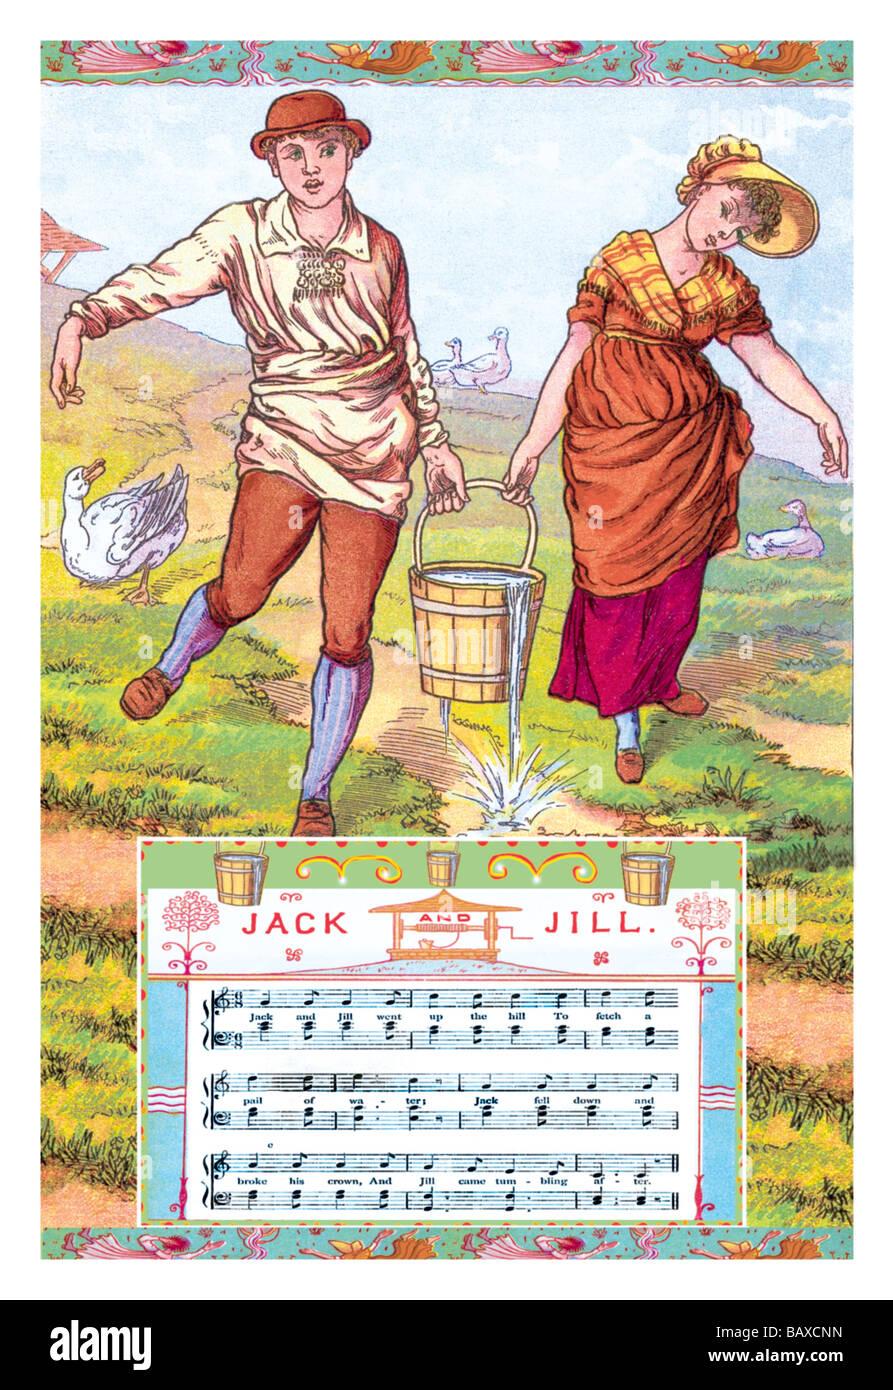 Jack Jill site de rencontre